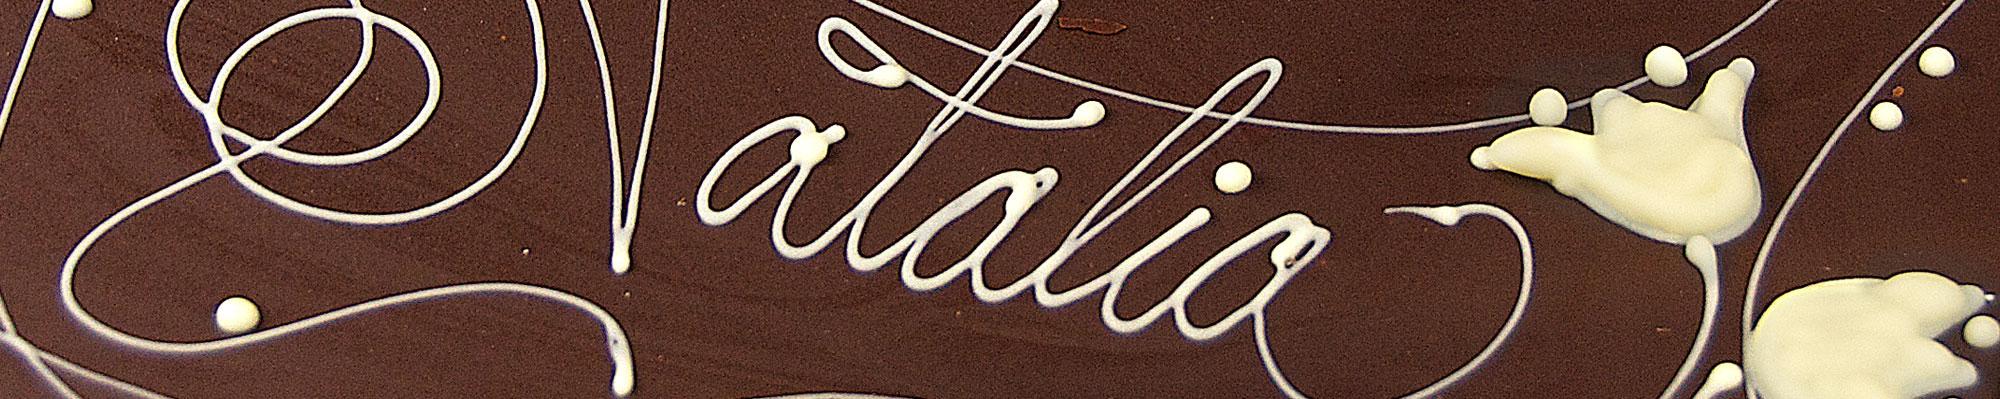 fondo_titular_chocolate